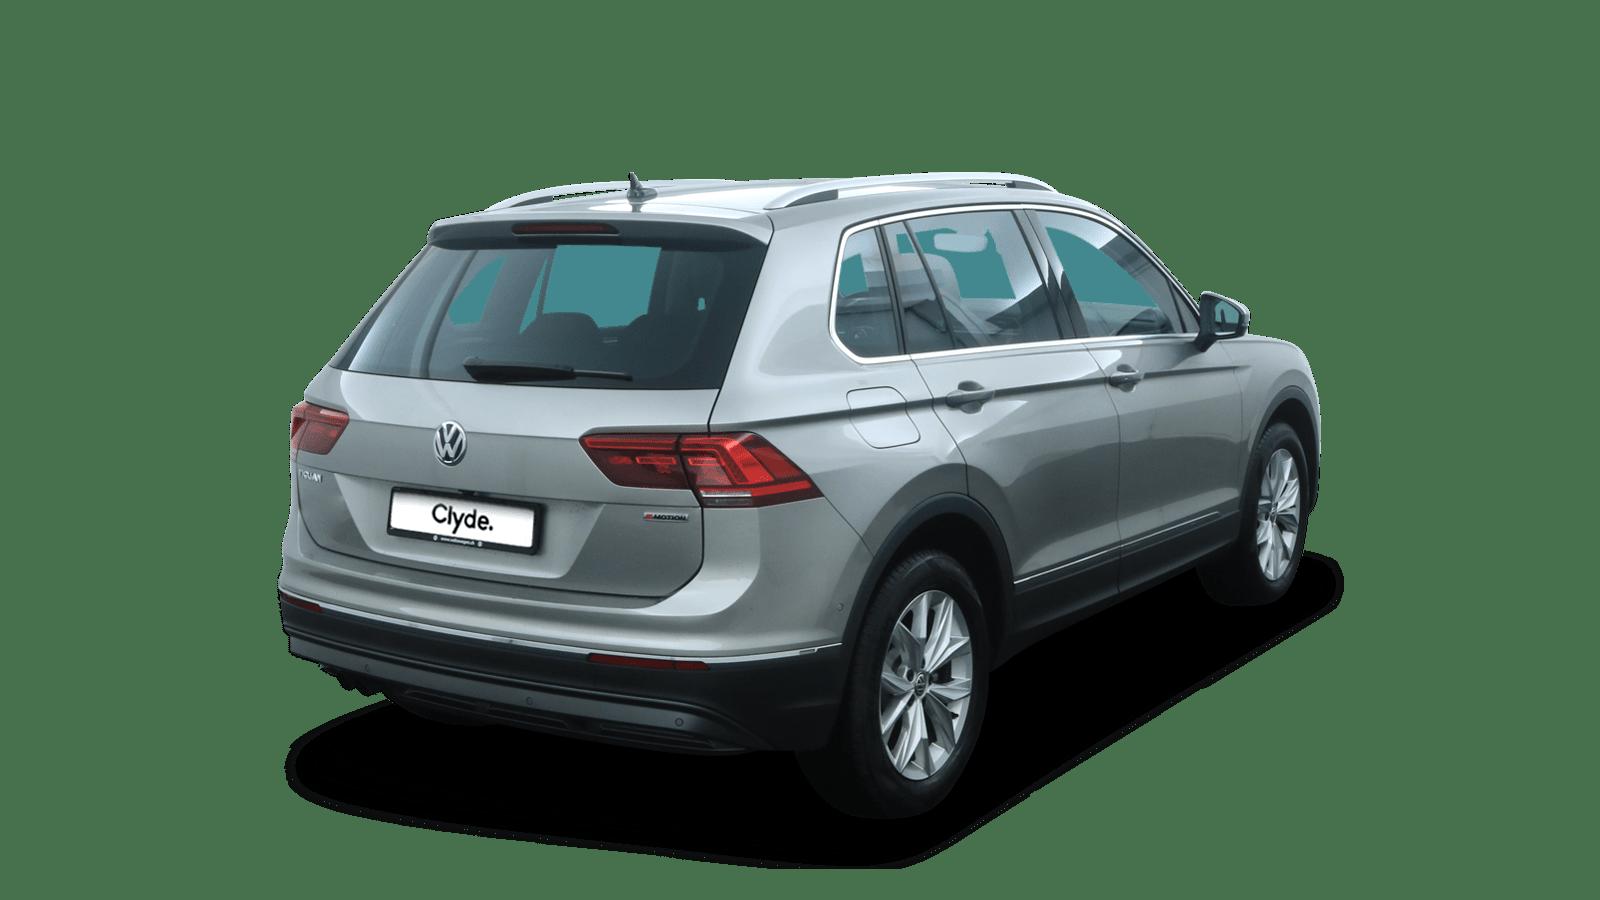 VW Tiguan Silber rückansicht - Clyde Auto-Abo